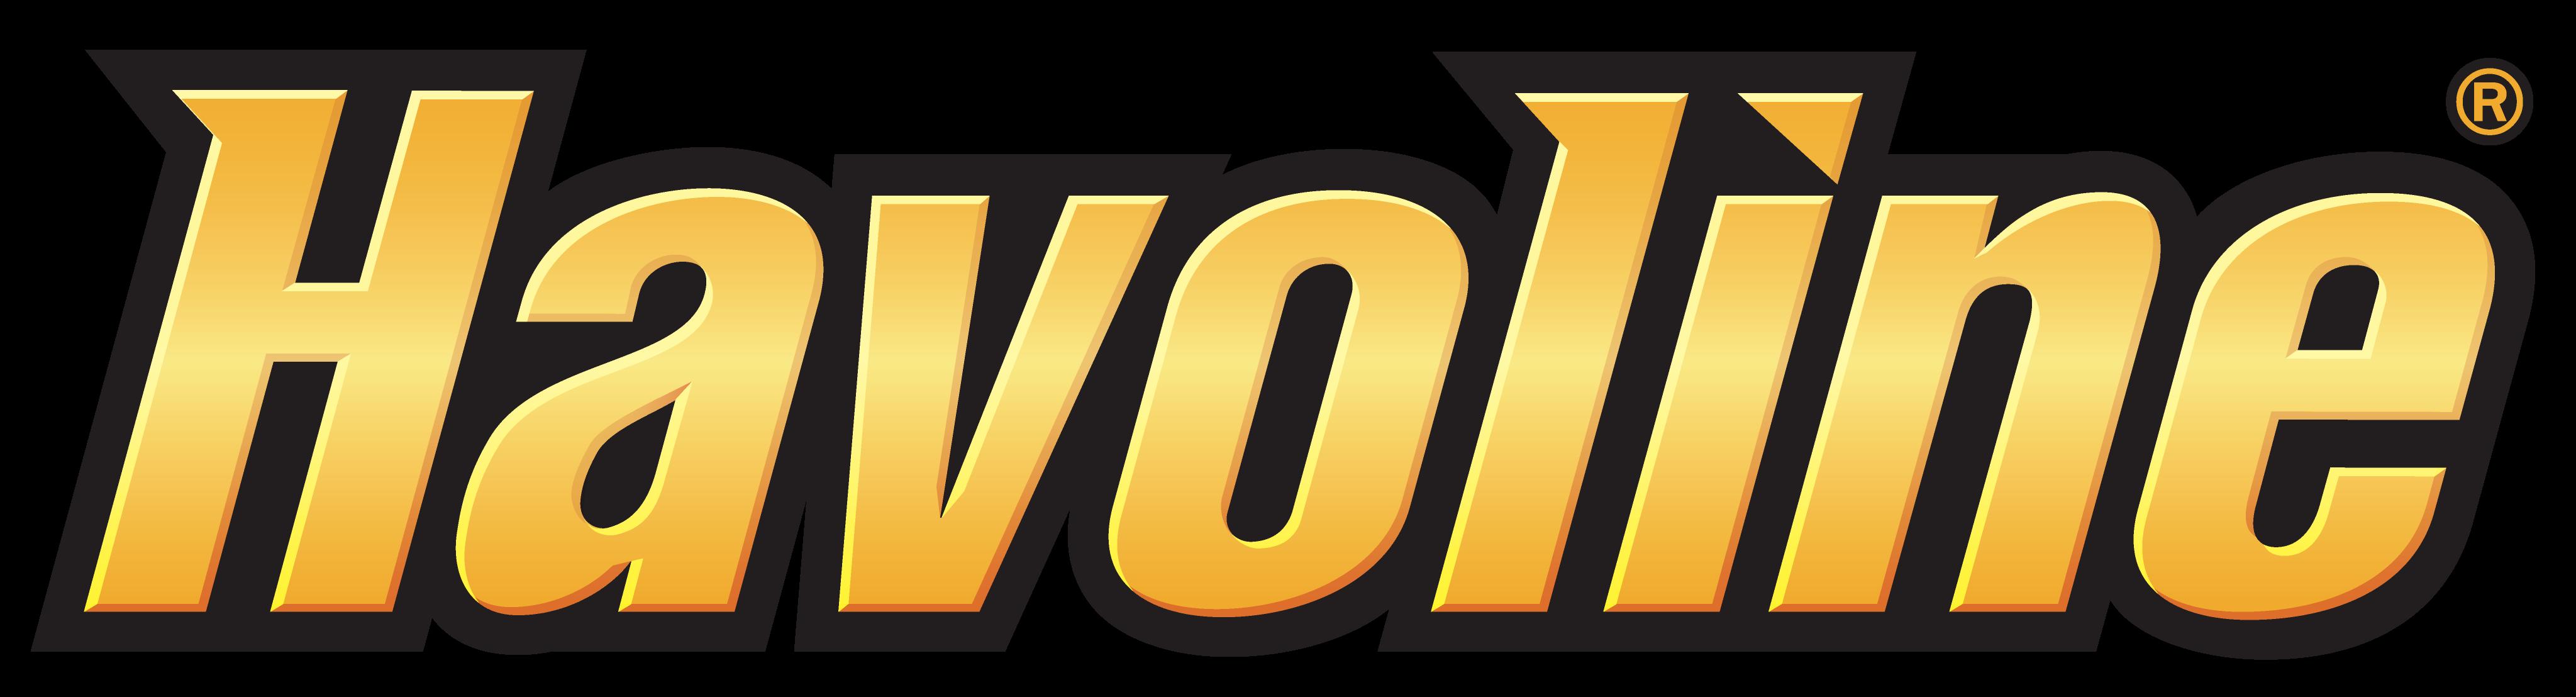 havoline logo 1 - Havoline Logo